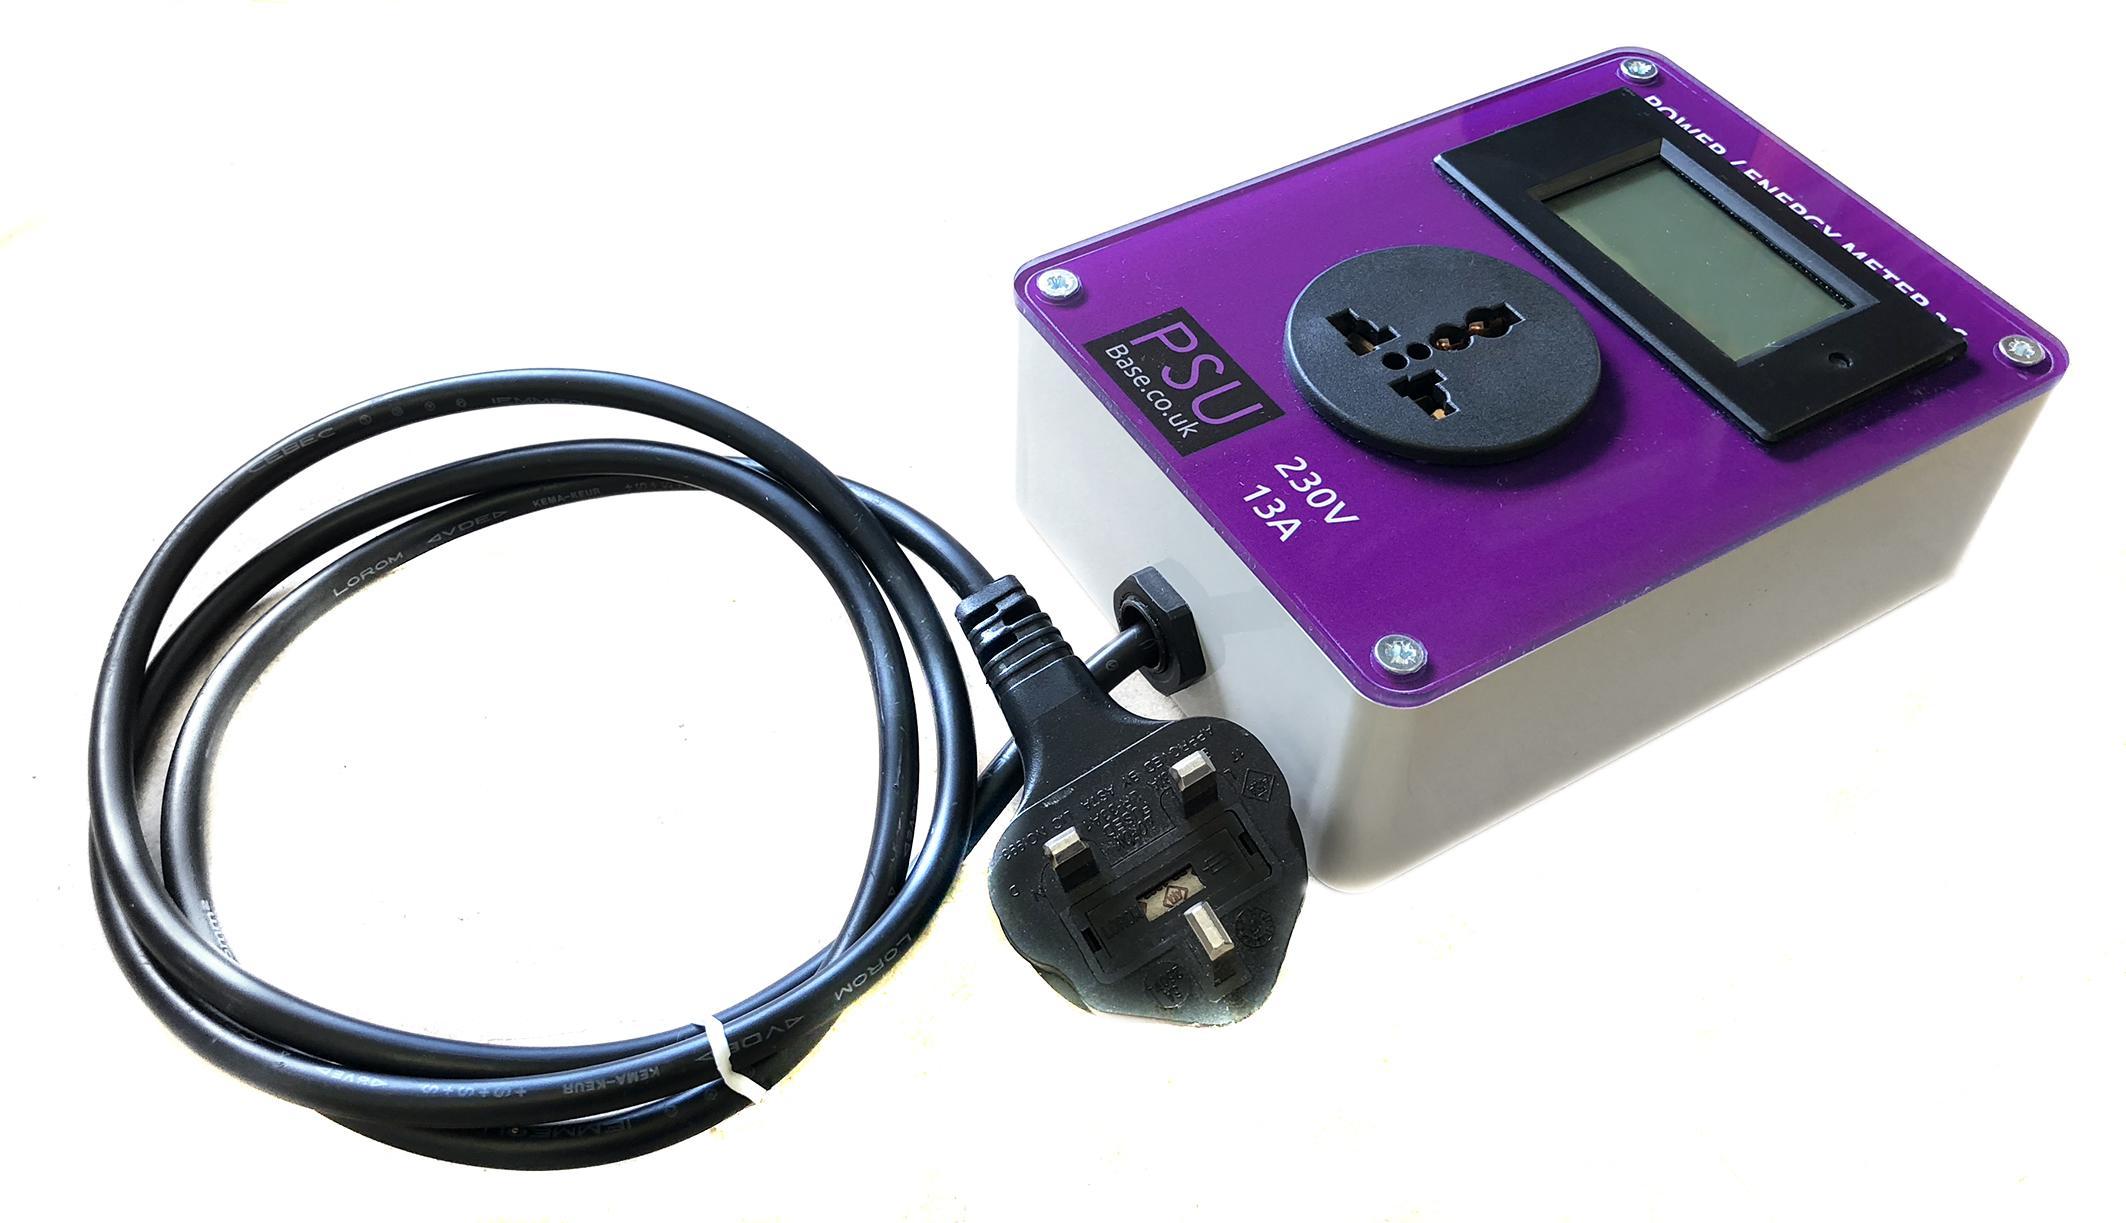 Power/Energy meter 230V ac 13A